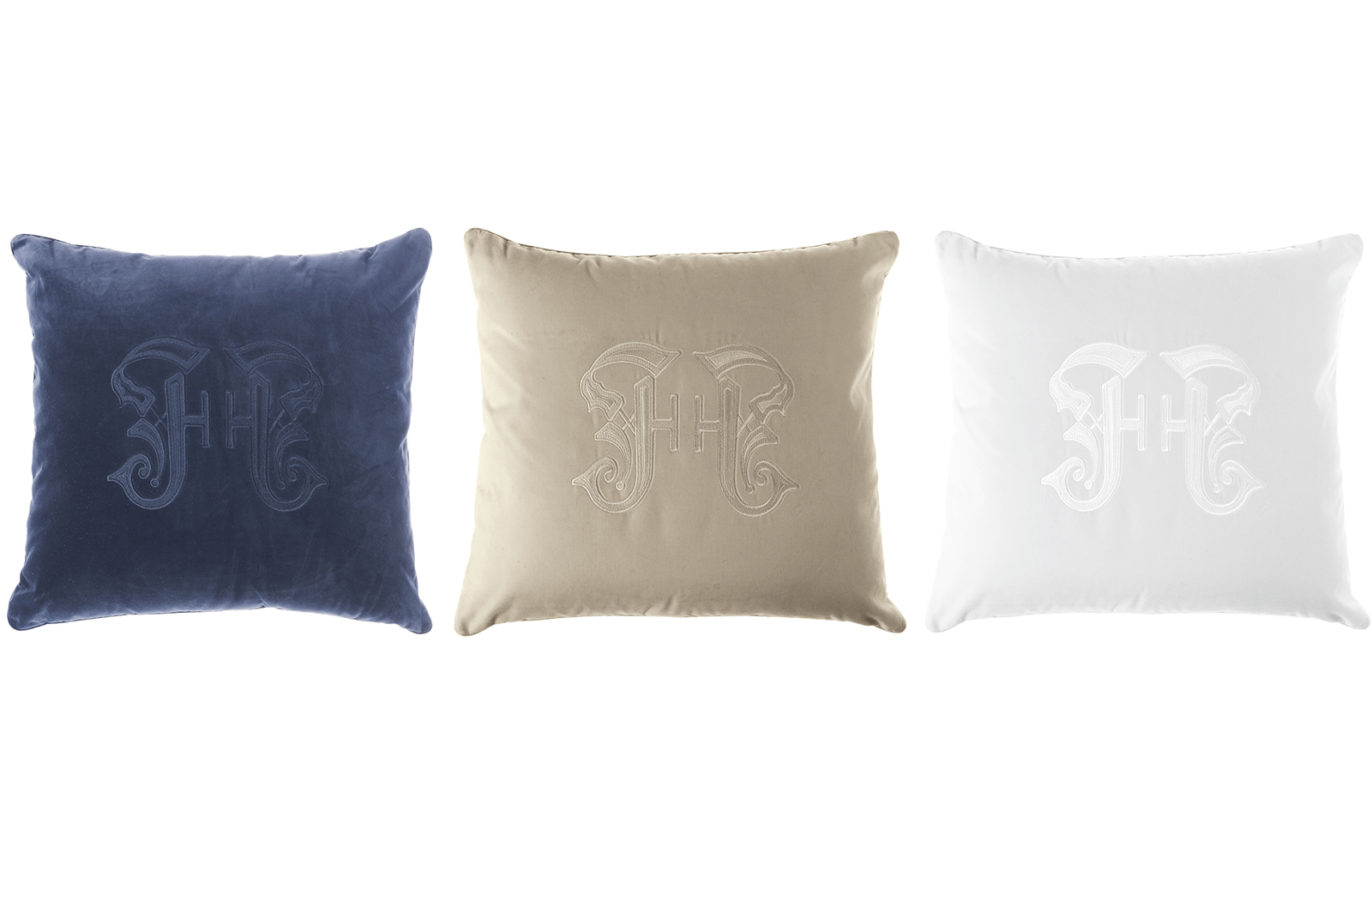 Gianfranco Ferre Home Gothic Cushion